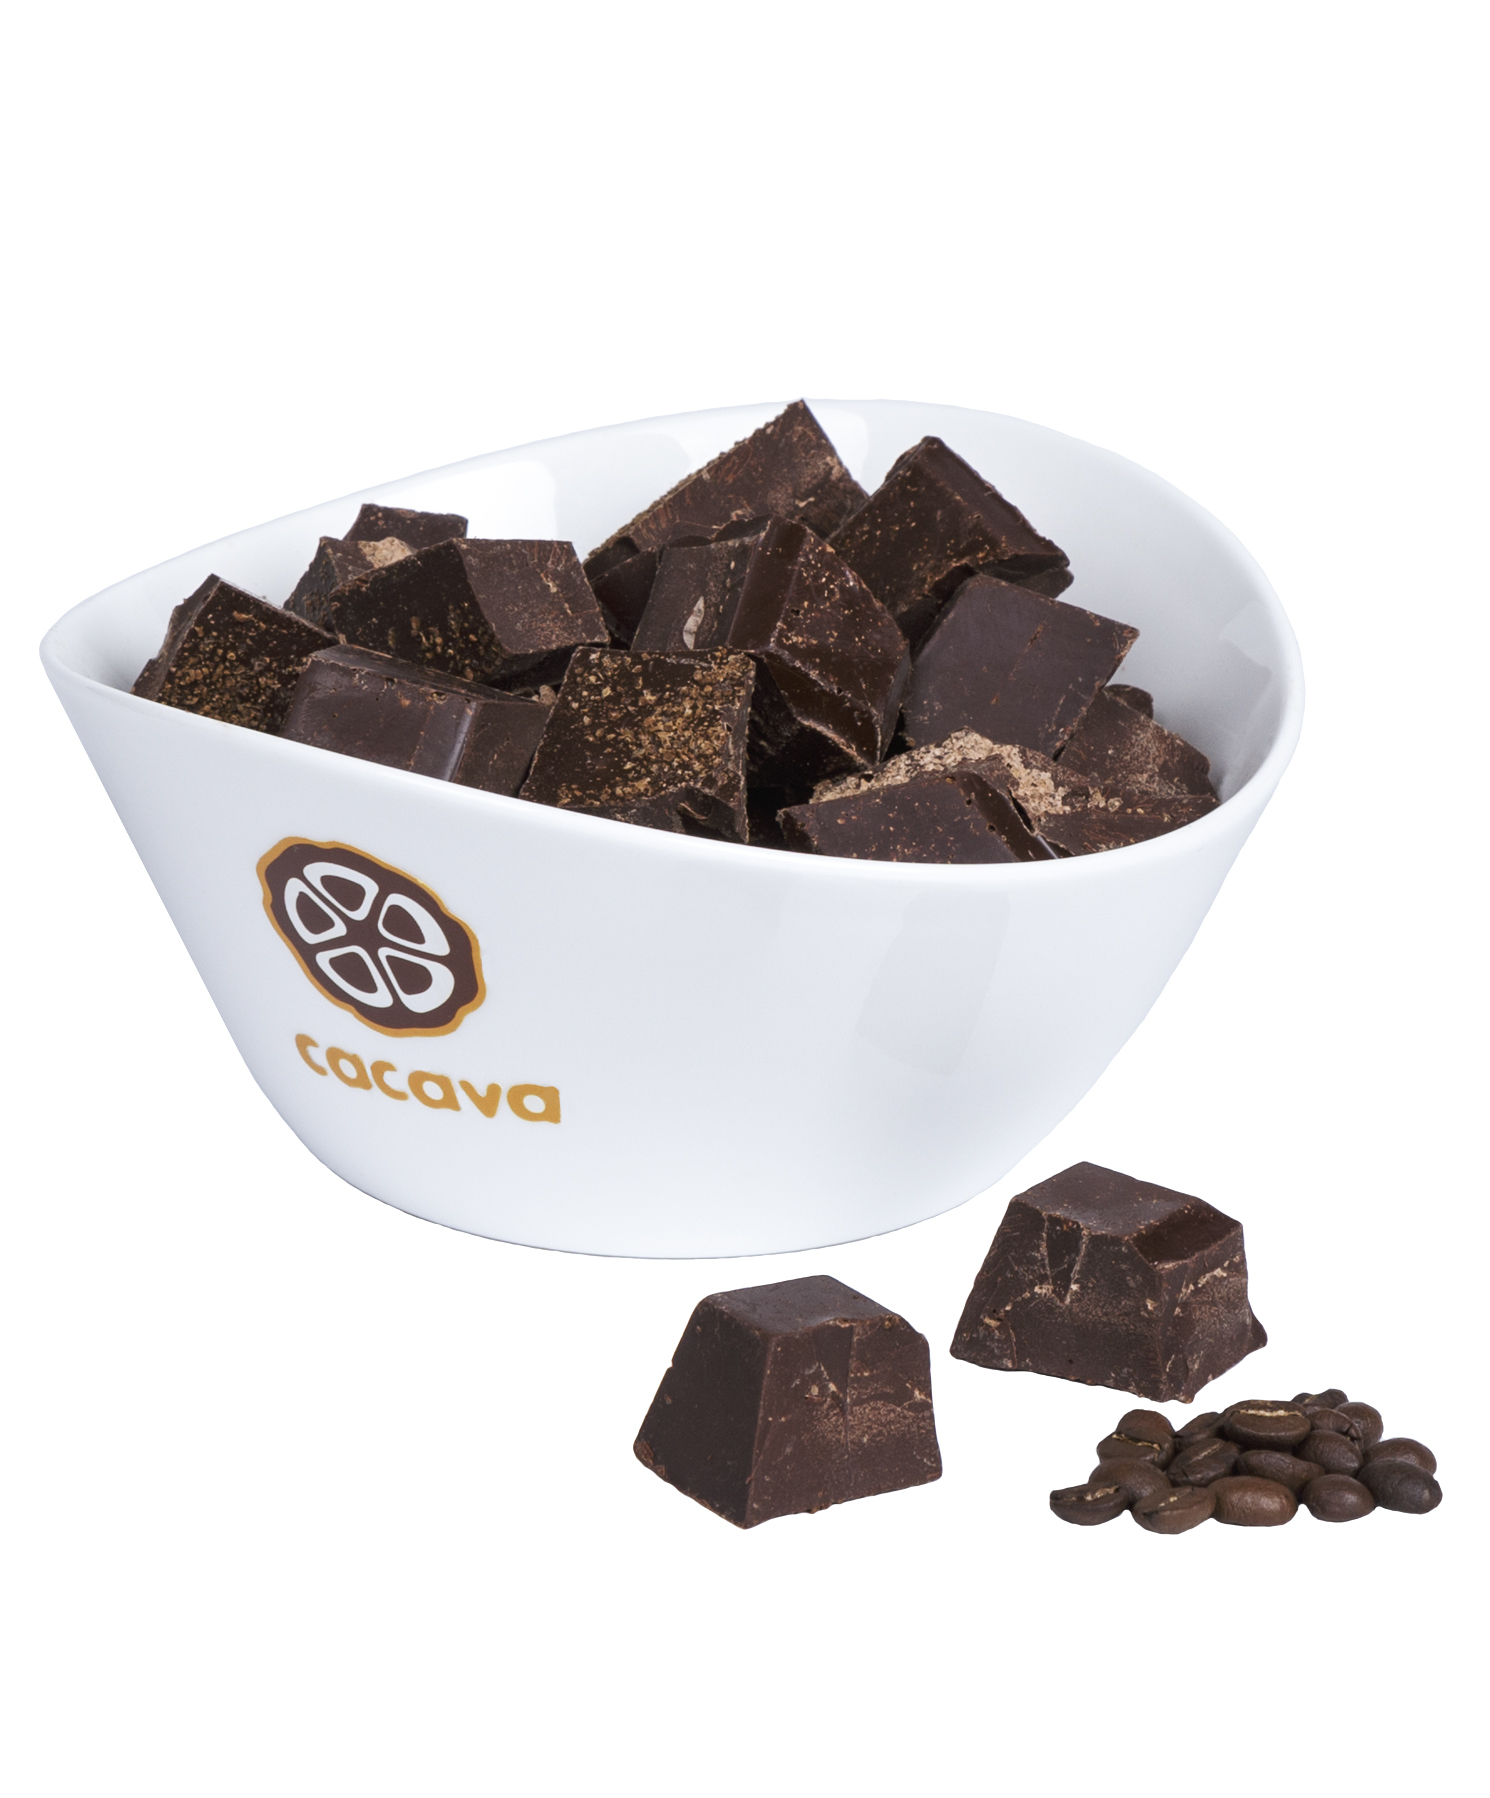 Тёмный шоколад с кофе 70 % какао (Колумбия, Tumaco), внешний вид